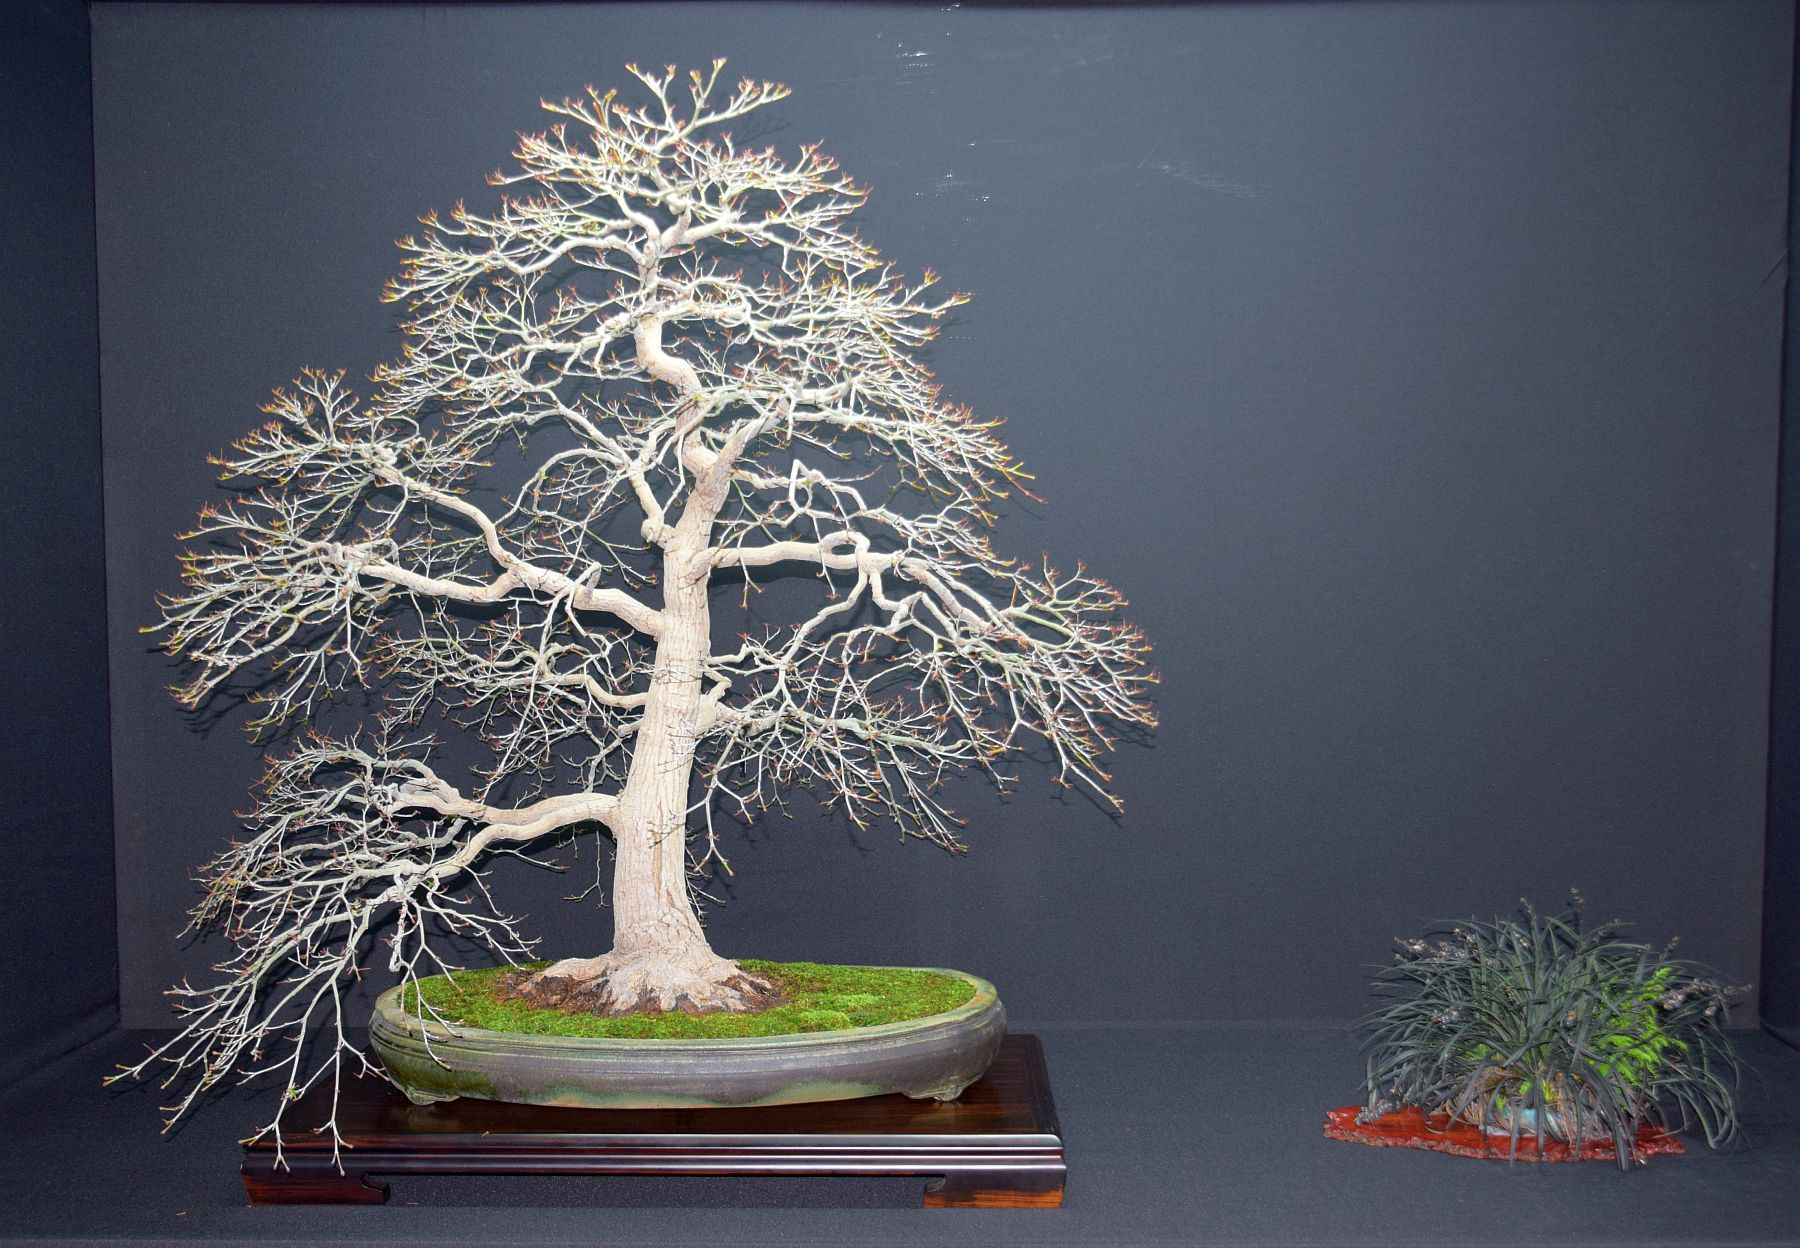 bonsai-museum-luis-vallejo-005